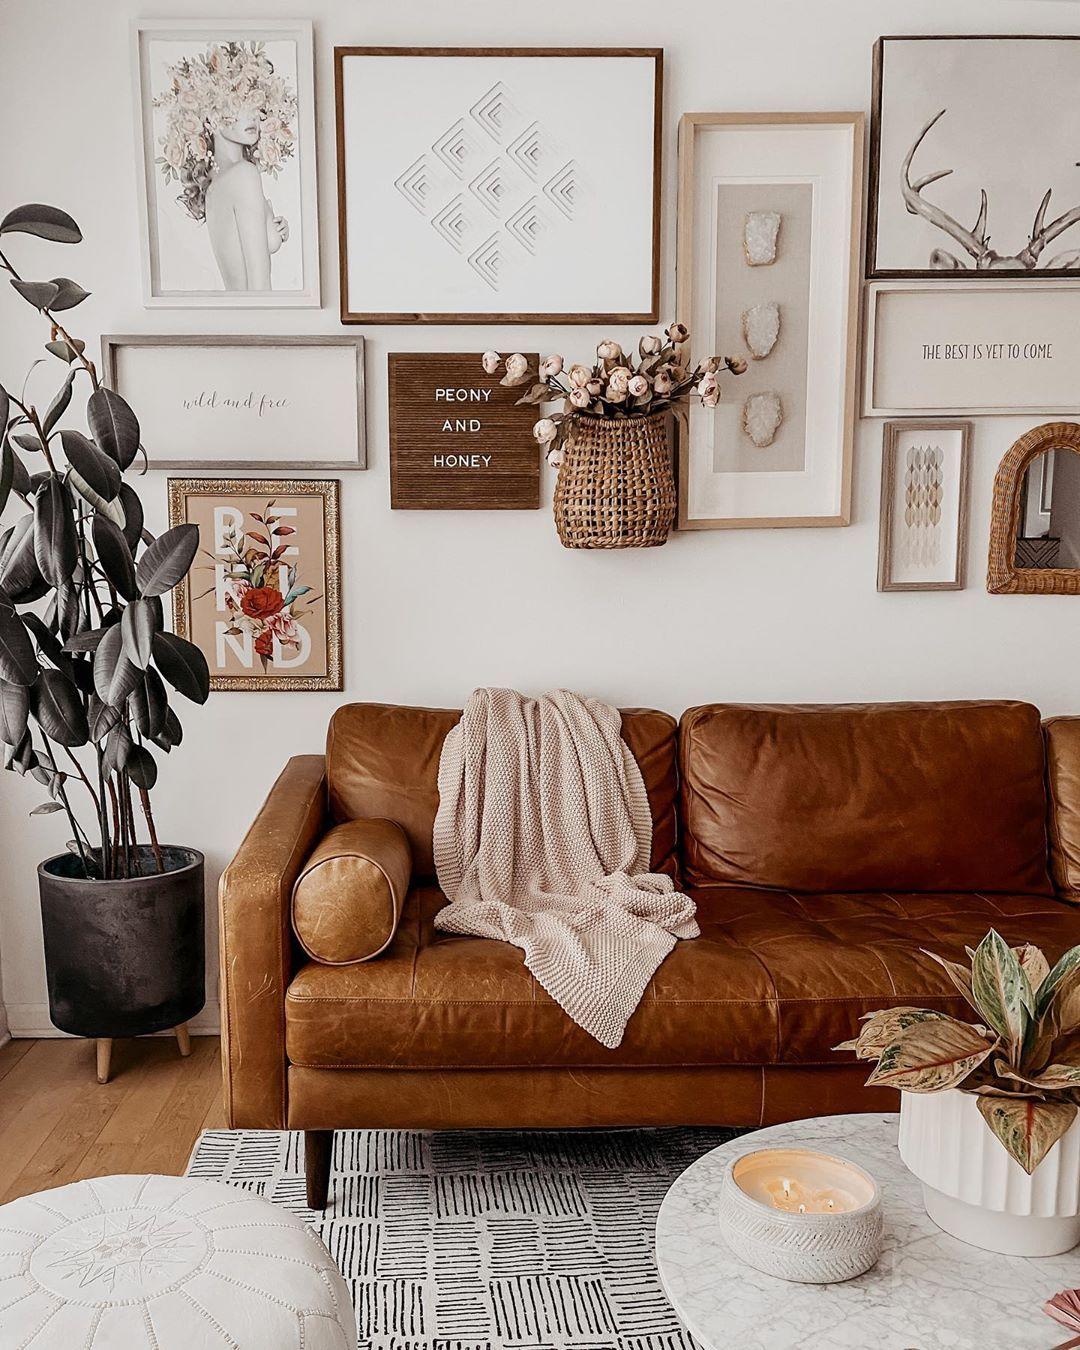 Boho Living Room Cognac Tan Leather Sofa Gallery Wall Neutral Home In 2020 Tan Leather Sofa Living Room Tan Walls Living Room Leather Couches Living Room #tan #sofas #in #living #room